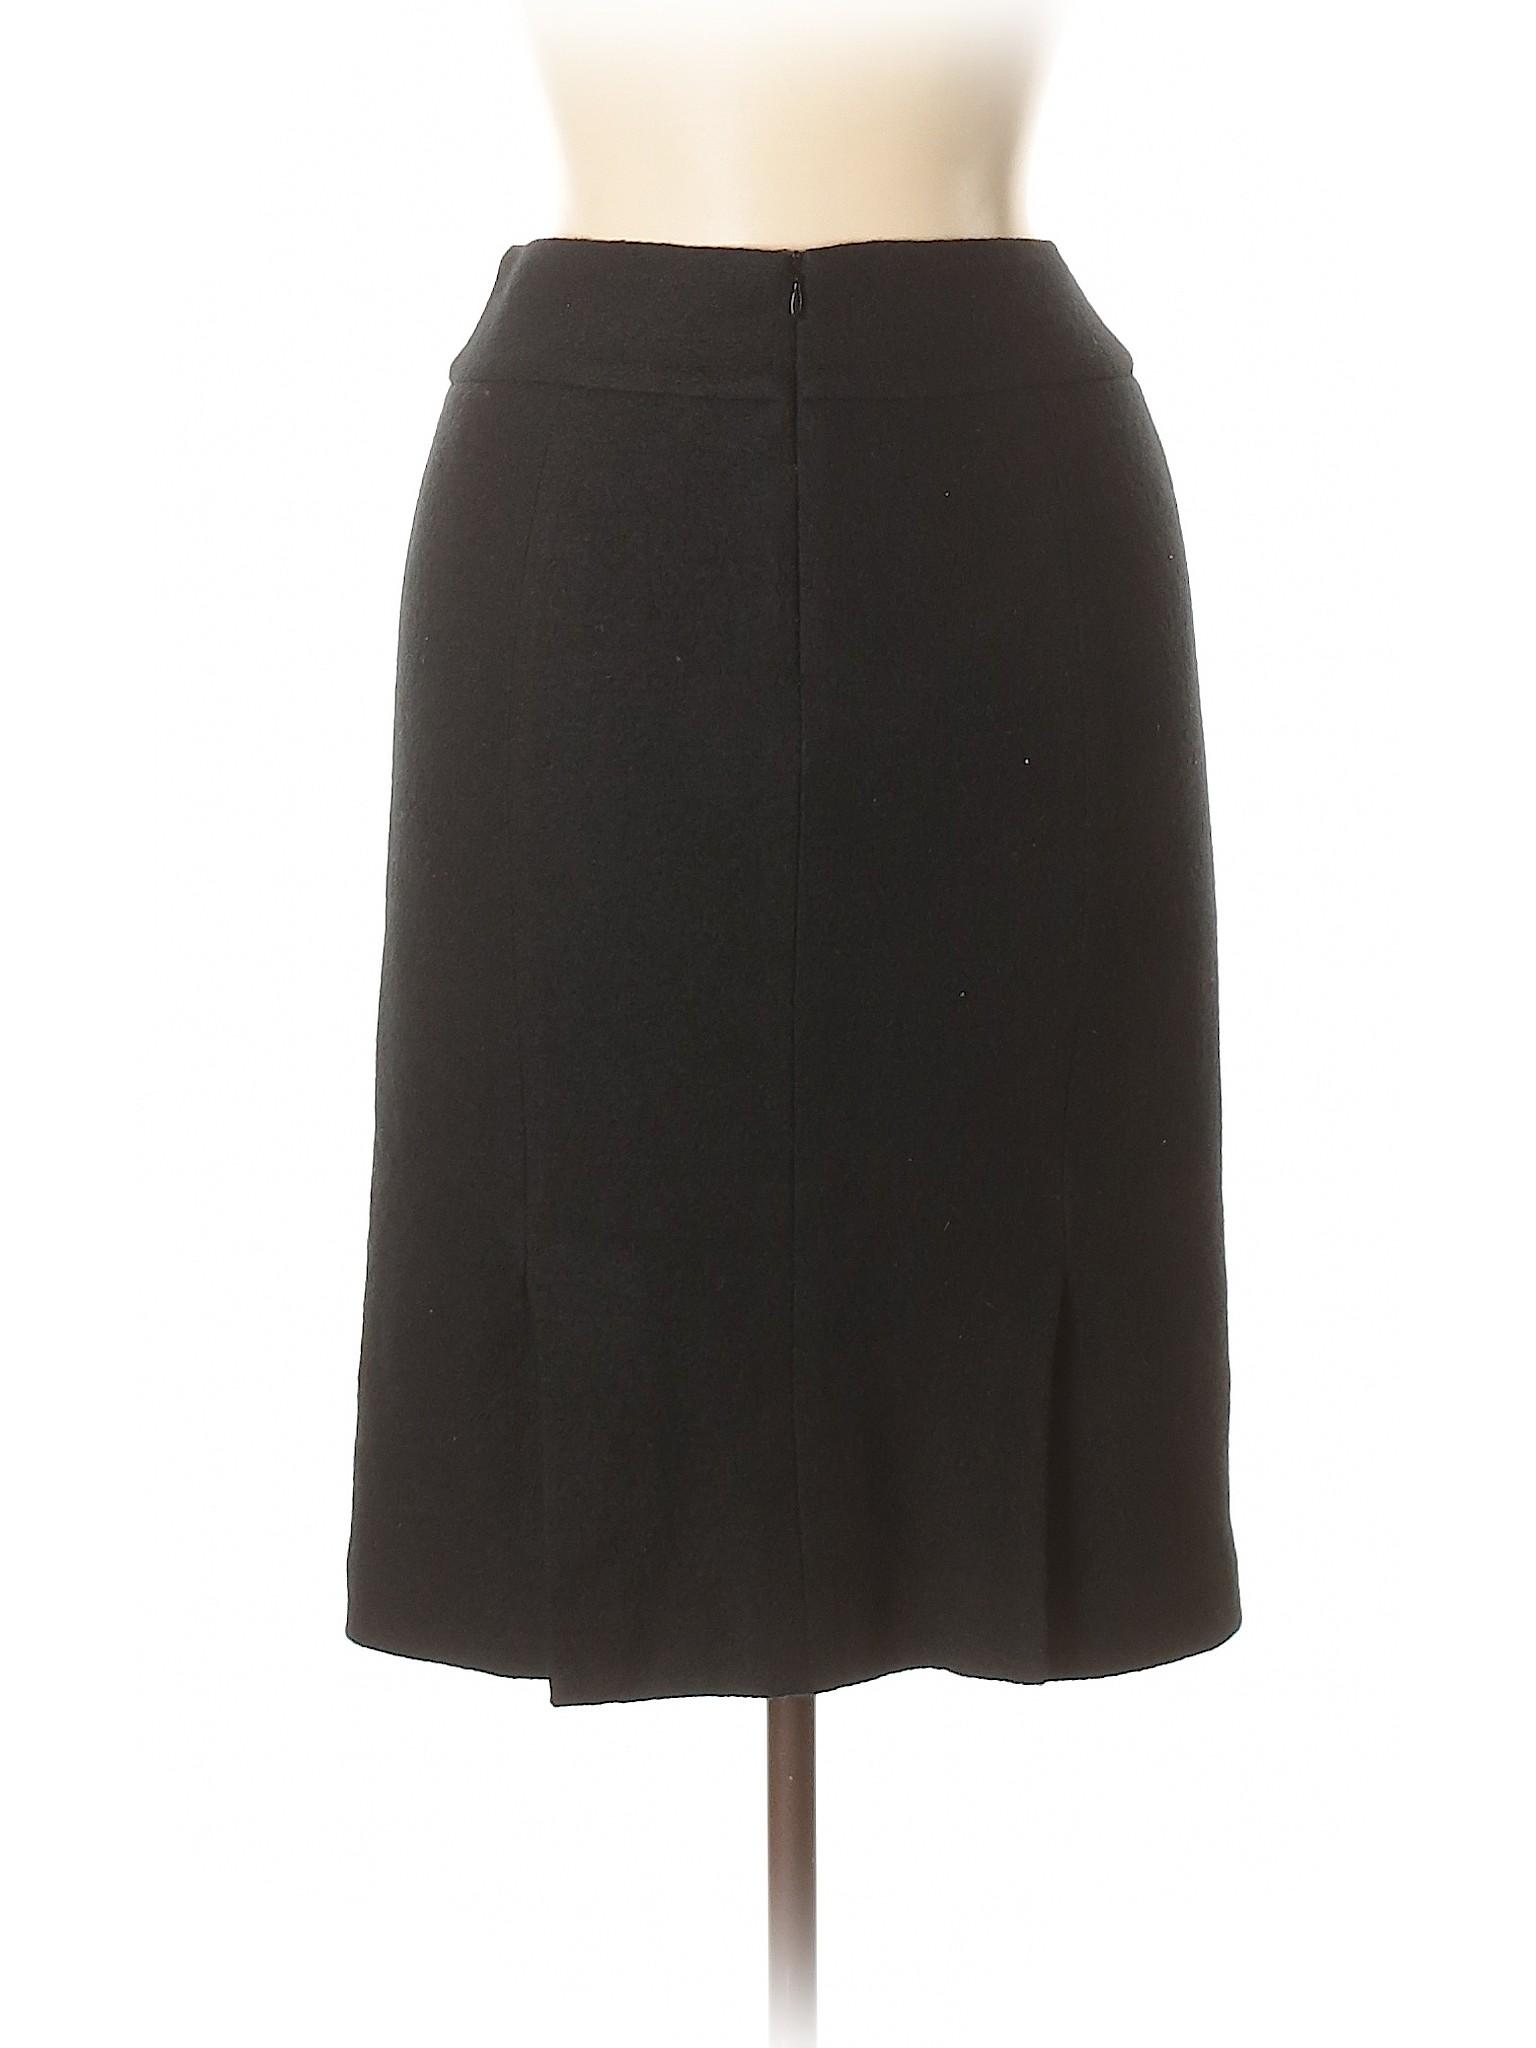 Skirt Boutique Republic leisure Casual Banana wIIFqg4